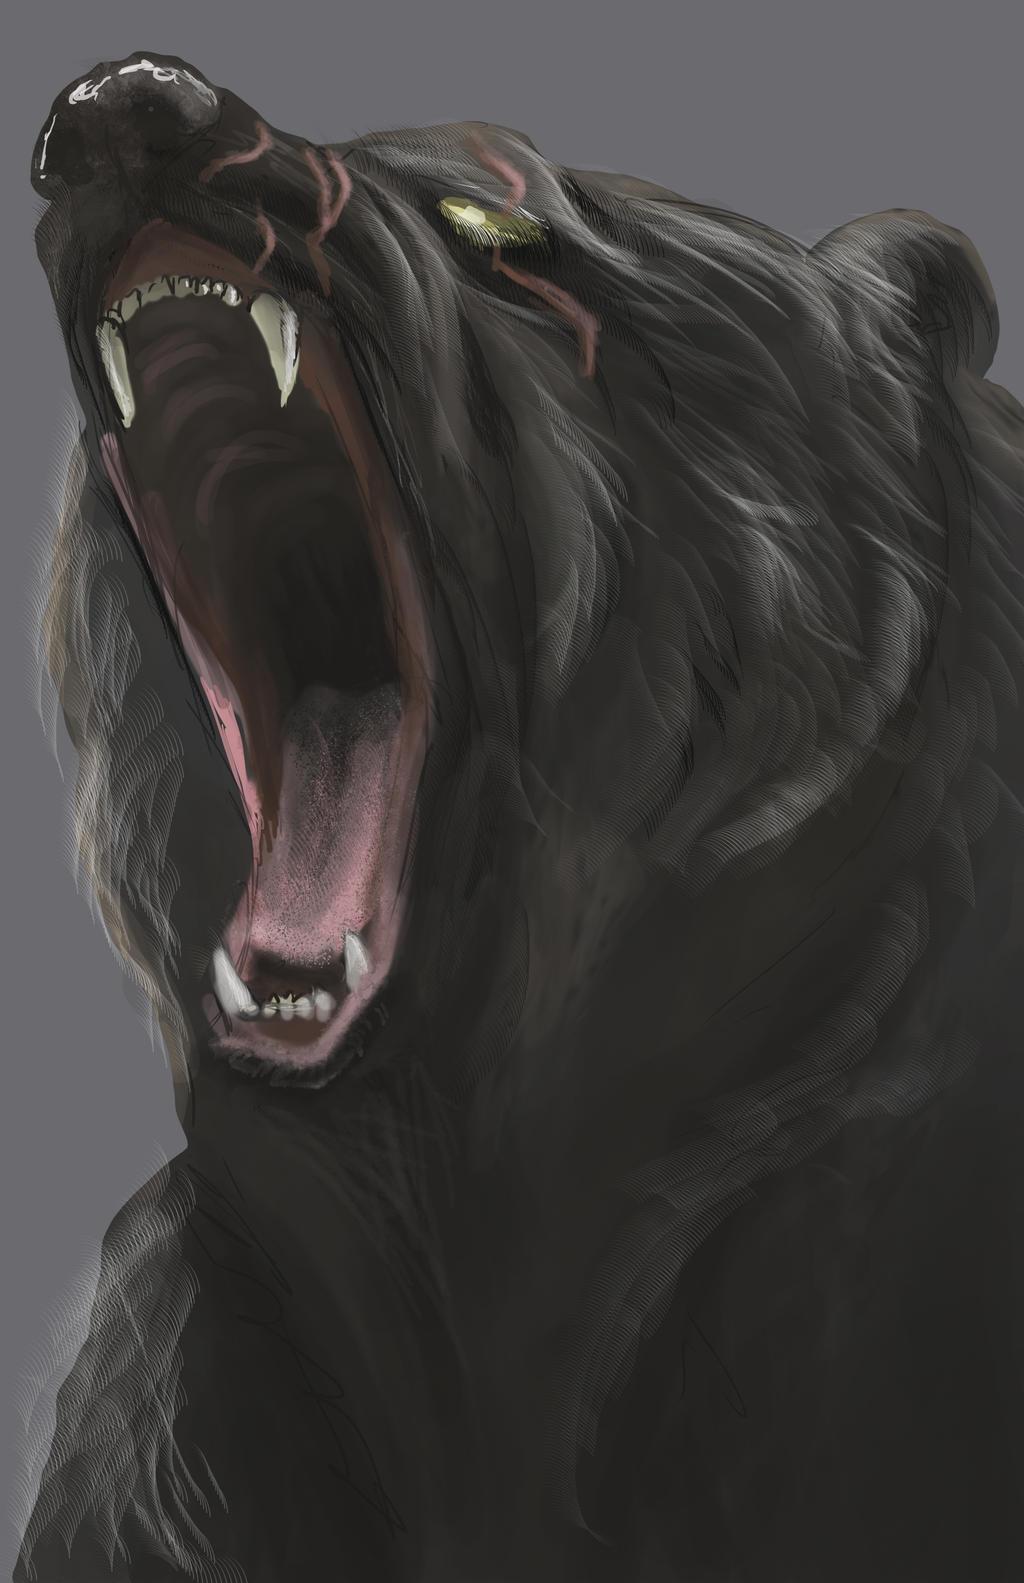 brave movie demon bear - photo #23